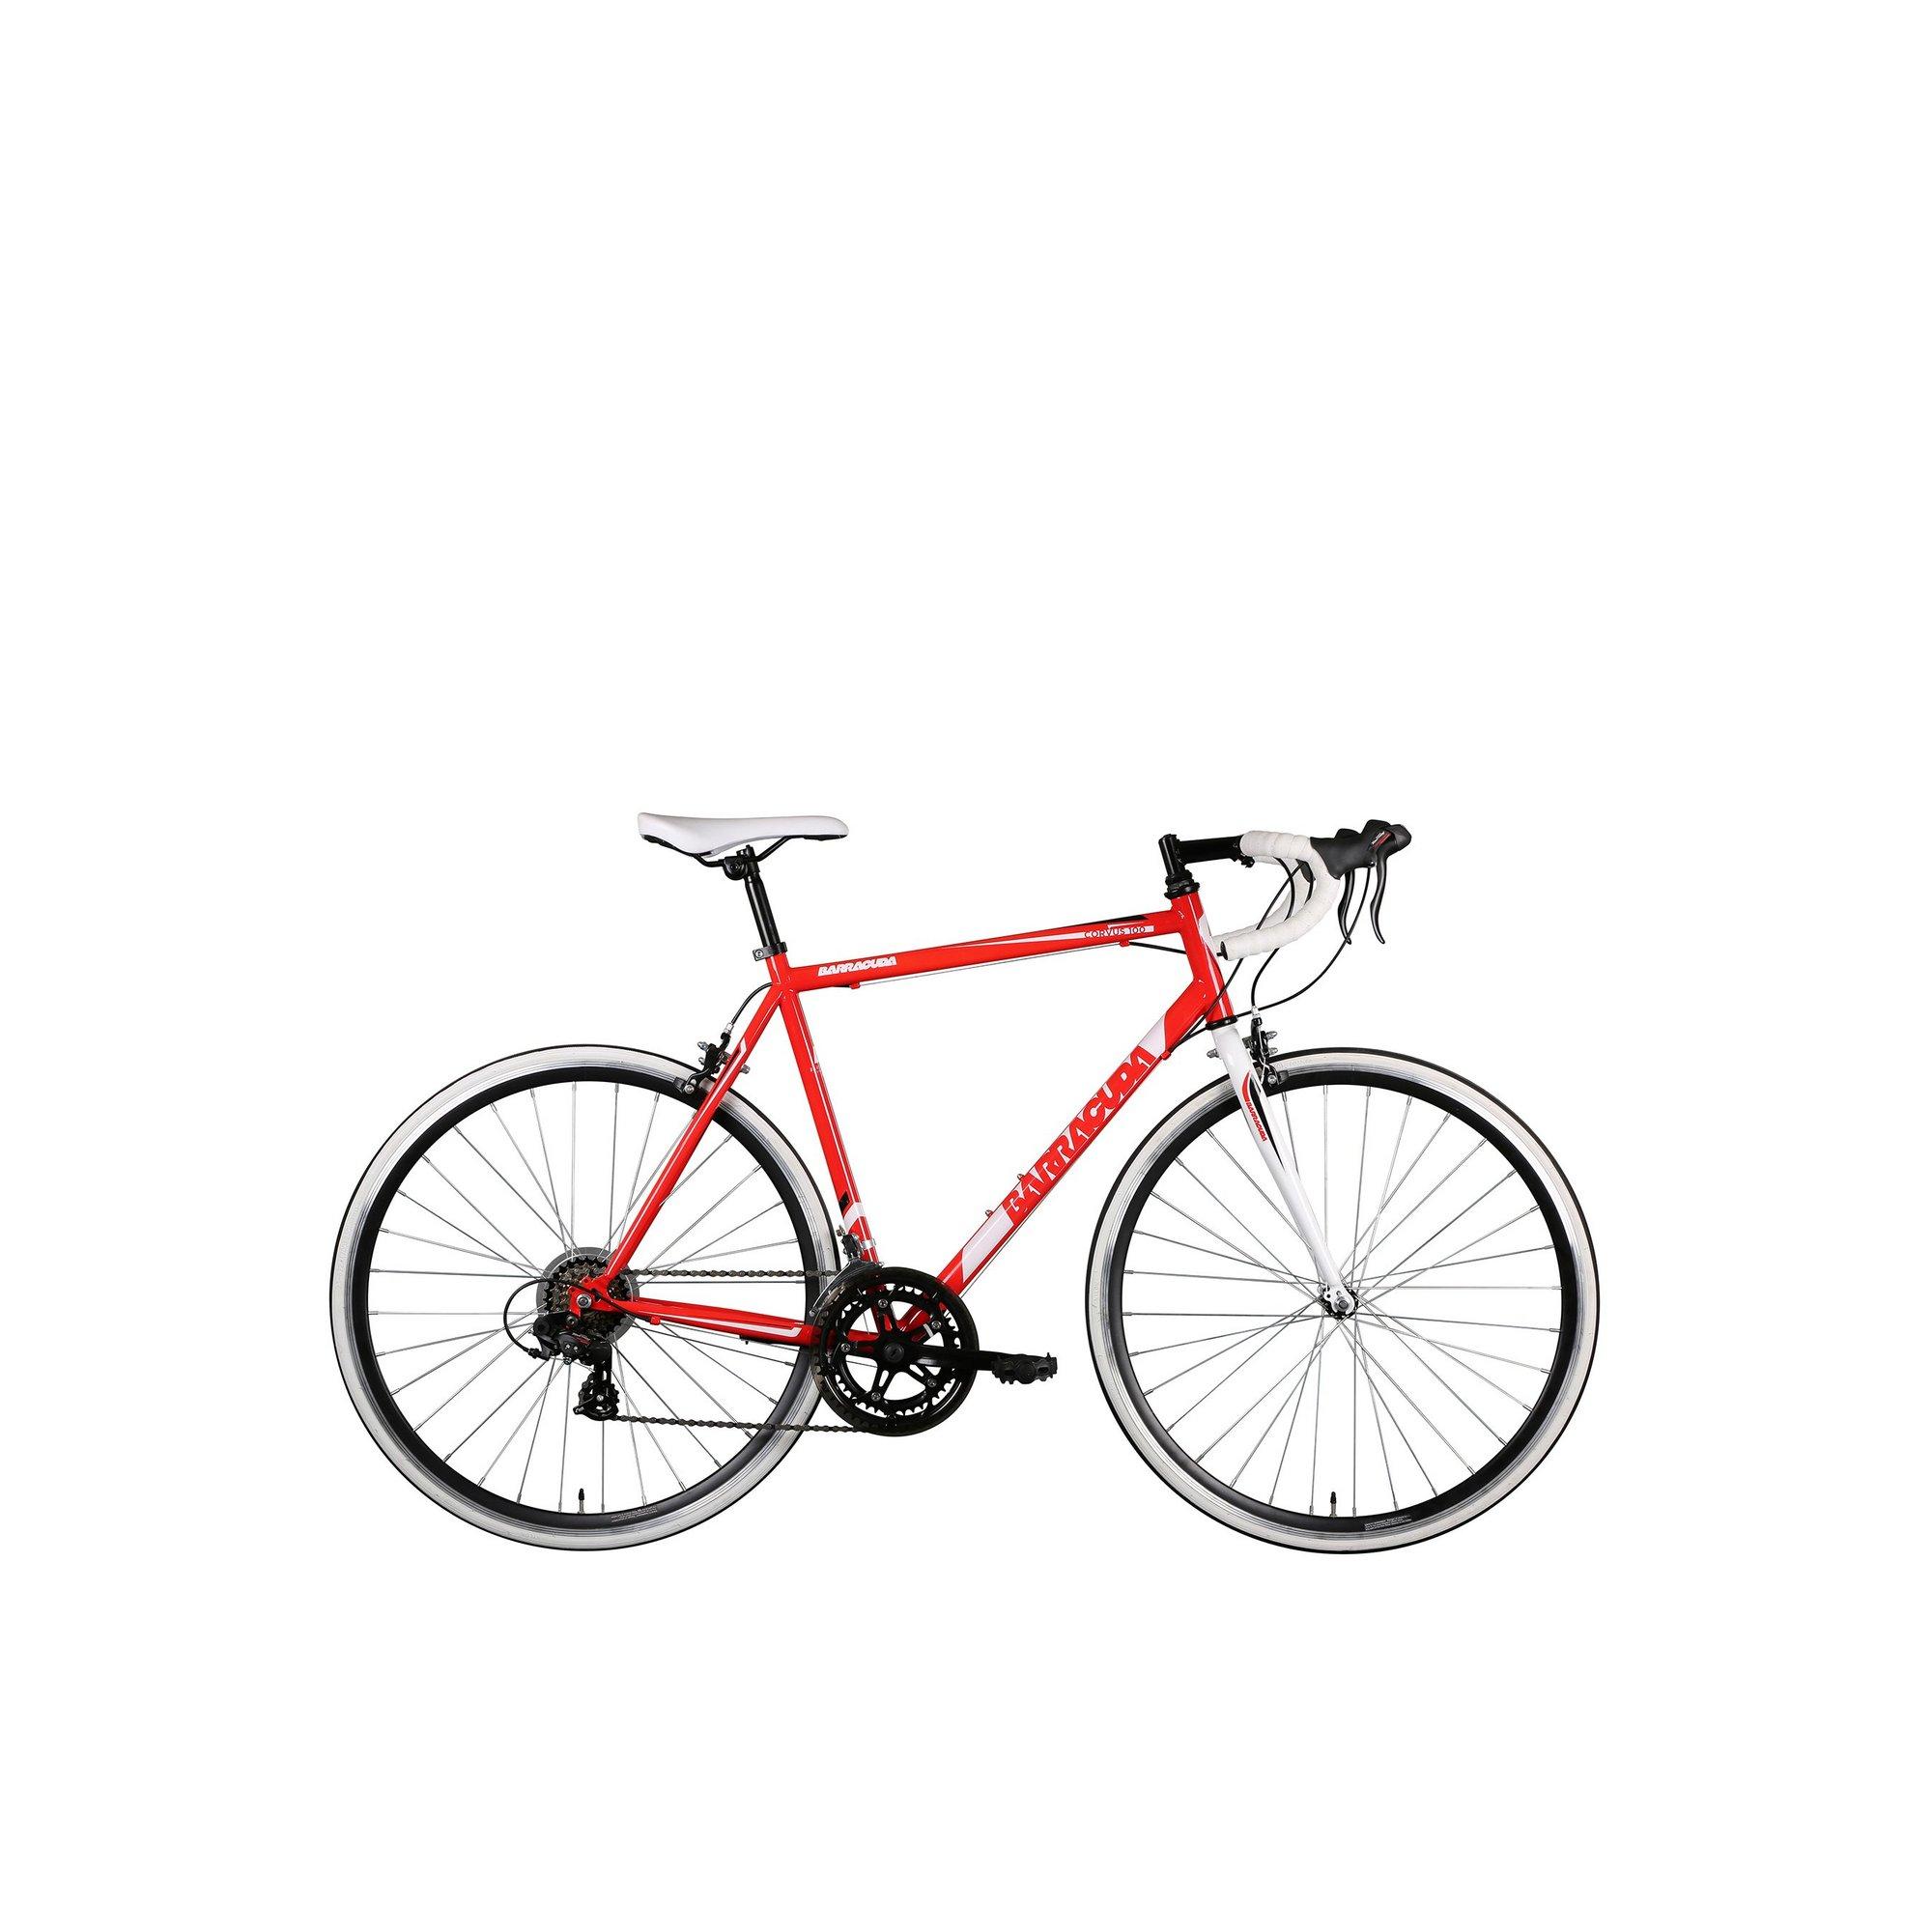 Image of Barracuda Corvus 100 Steel Road Bike STI Red/White